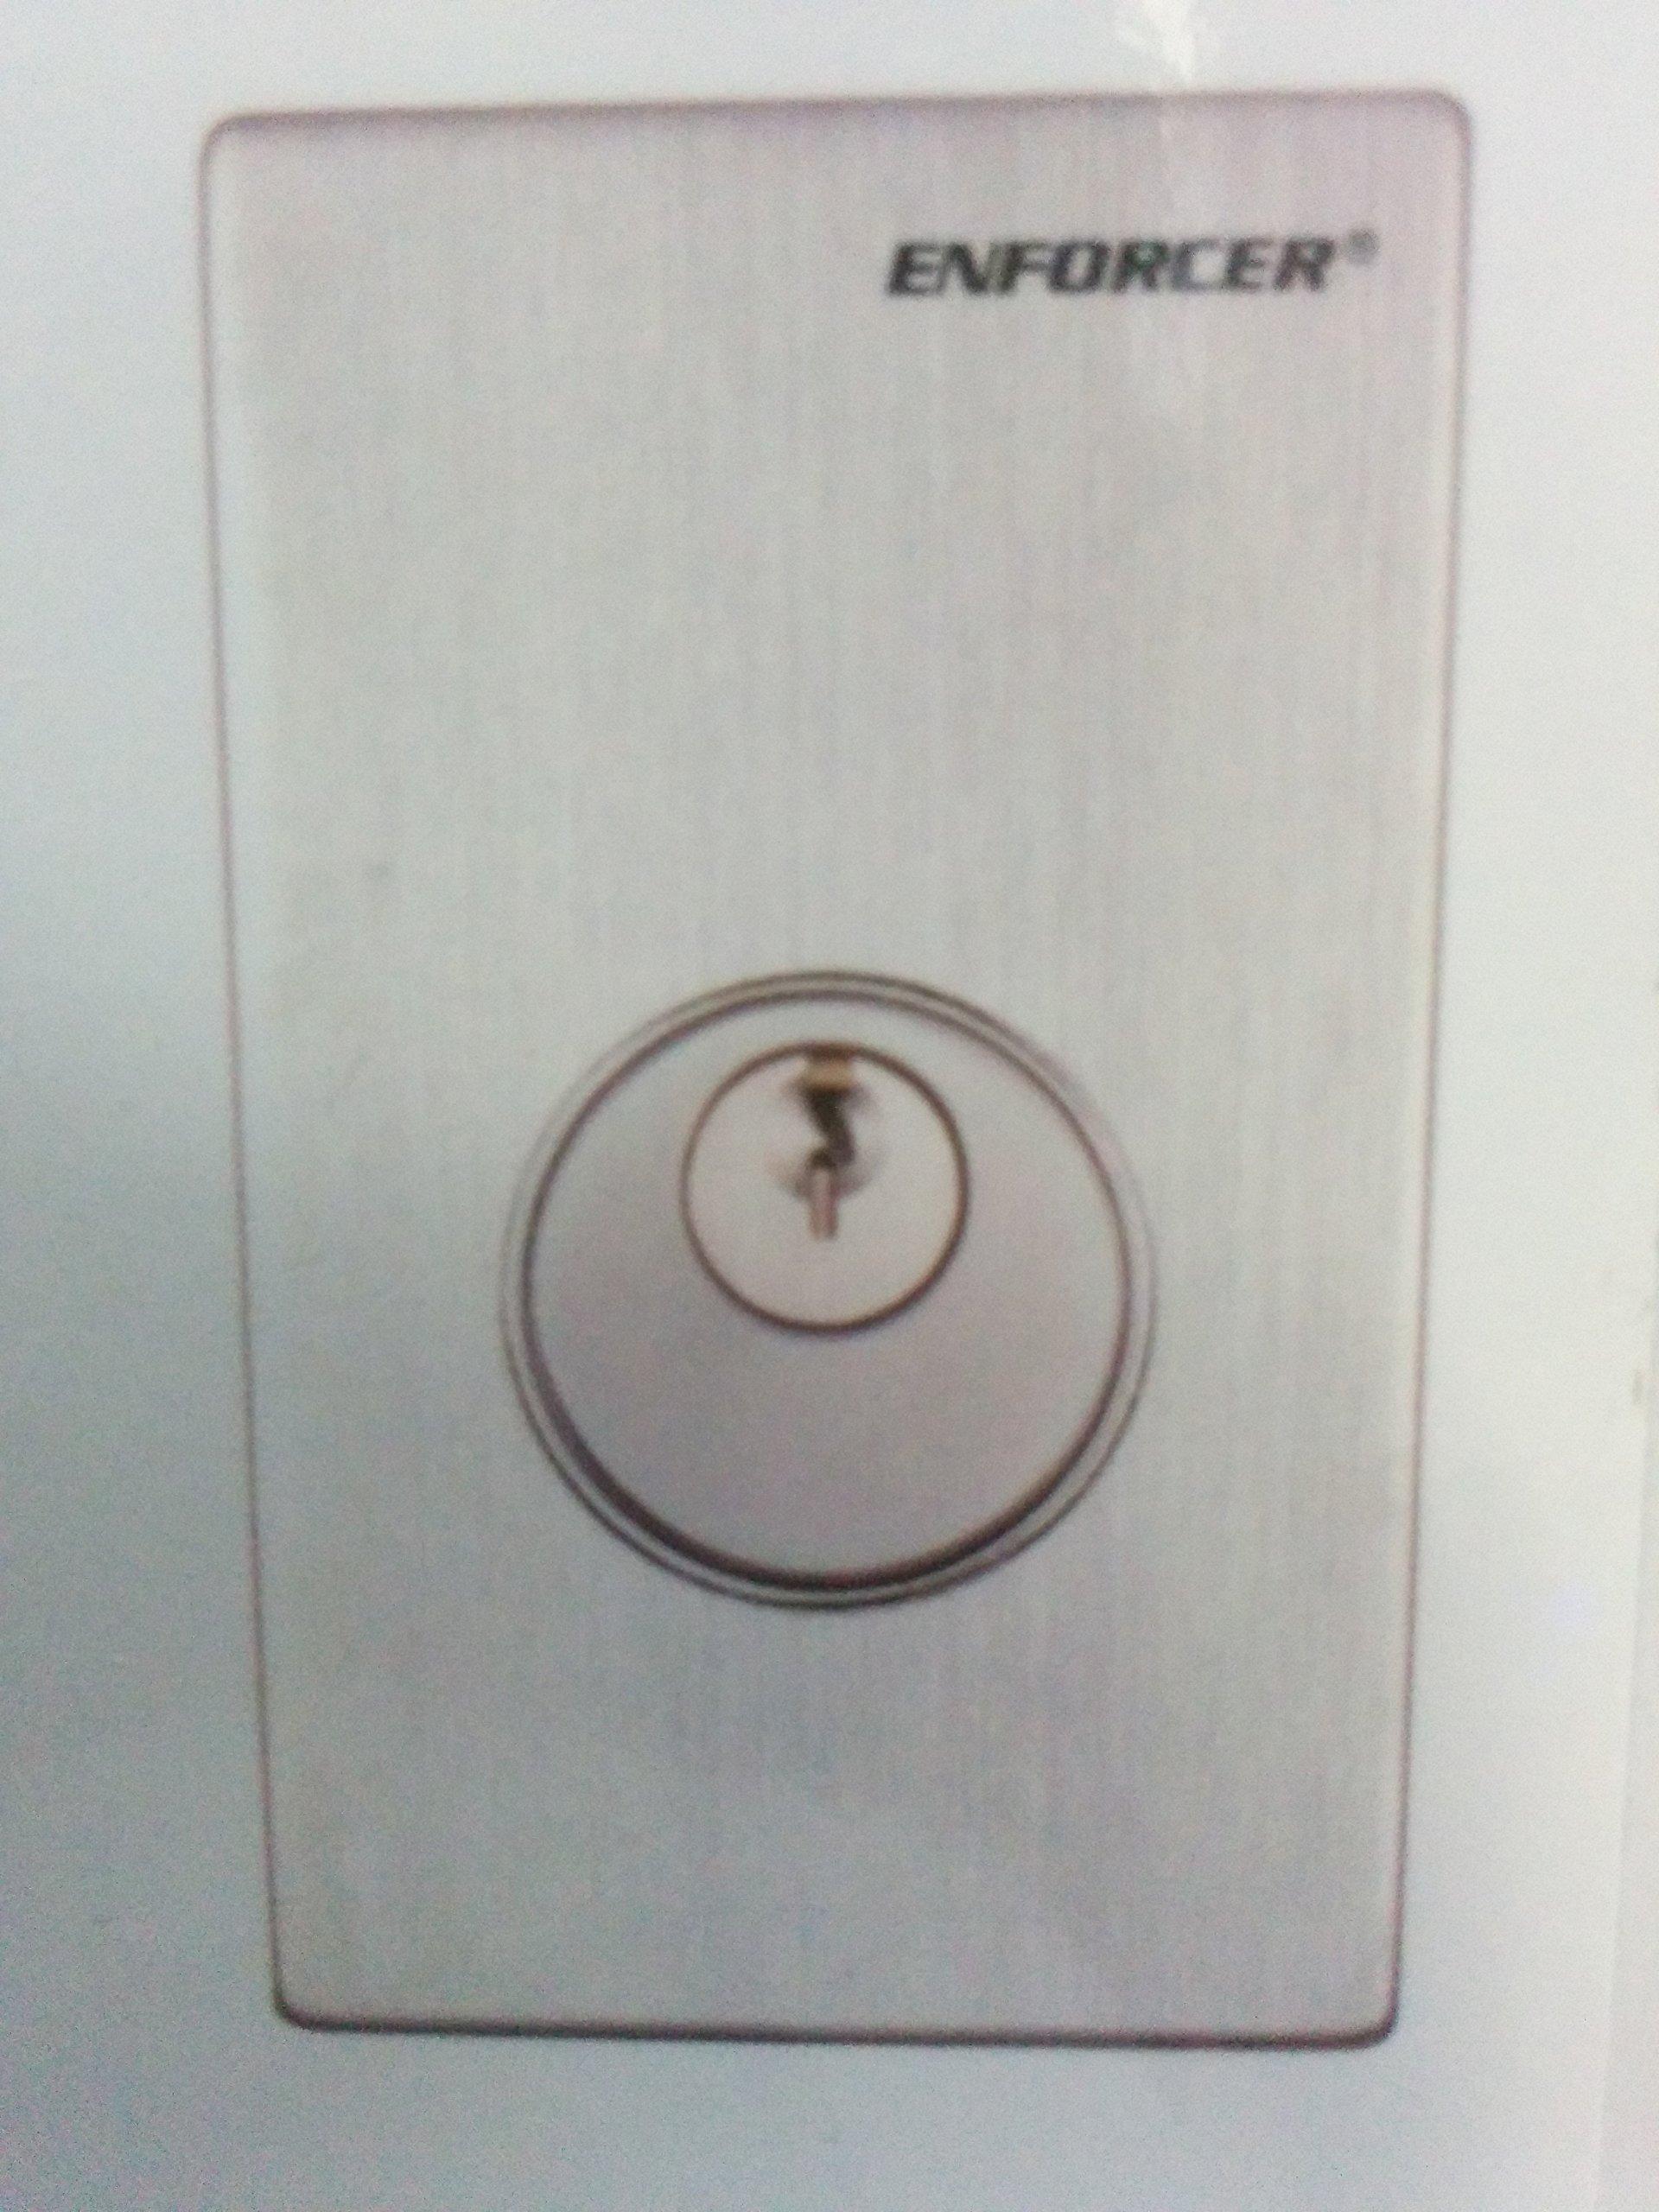 SD-72081-6MQ Seco-Larm Single-Gang Mortise Cylinder Key Switch